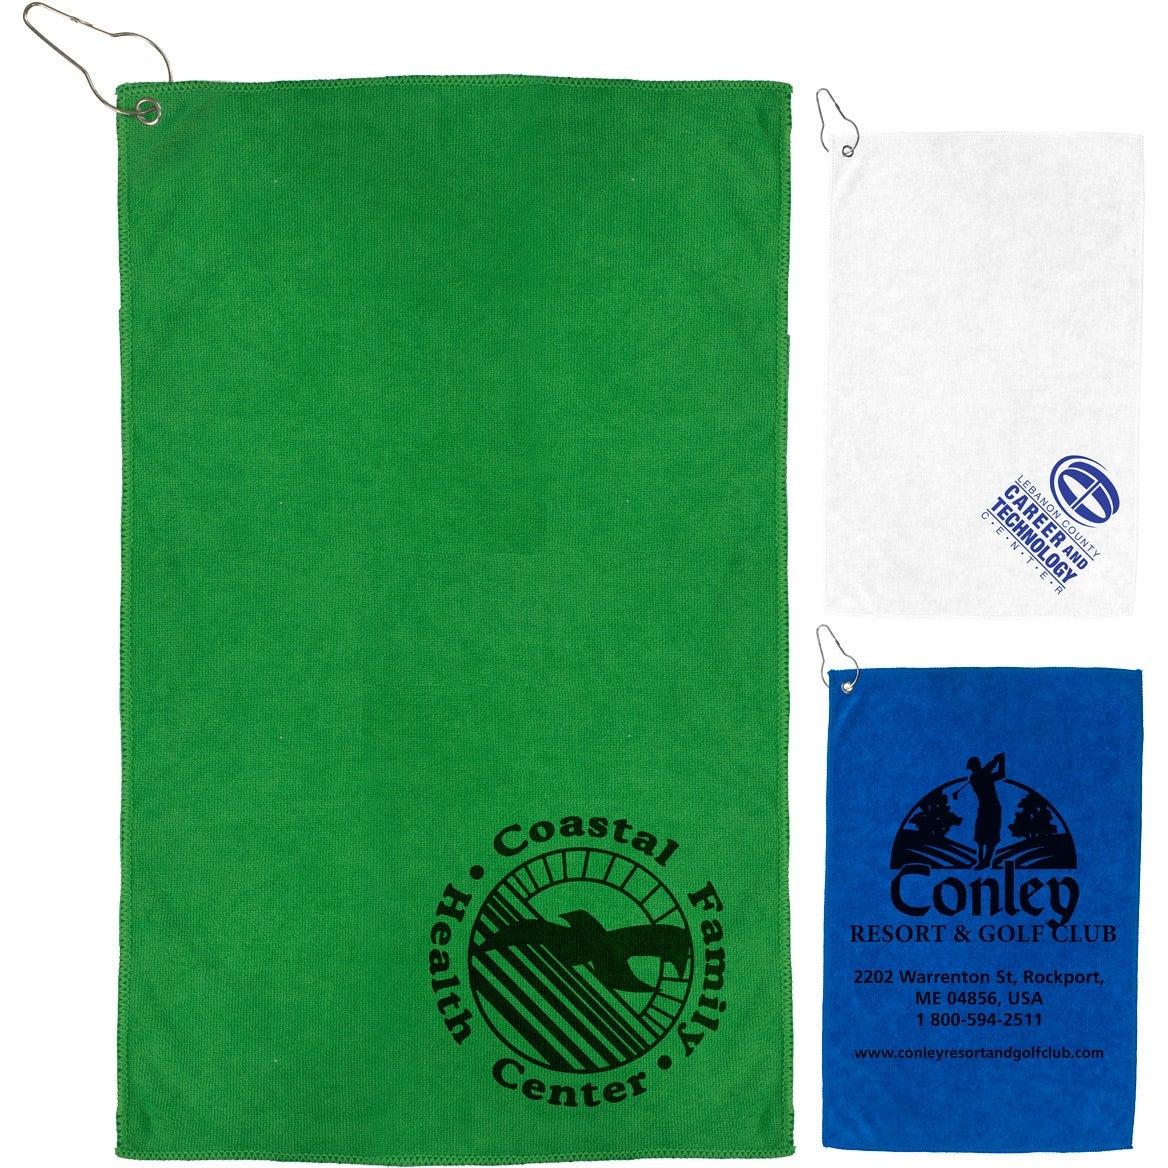 The Iron Heavy Duty Microfiber Golf Towel